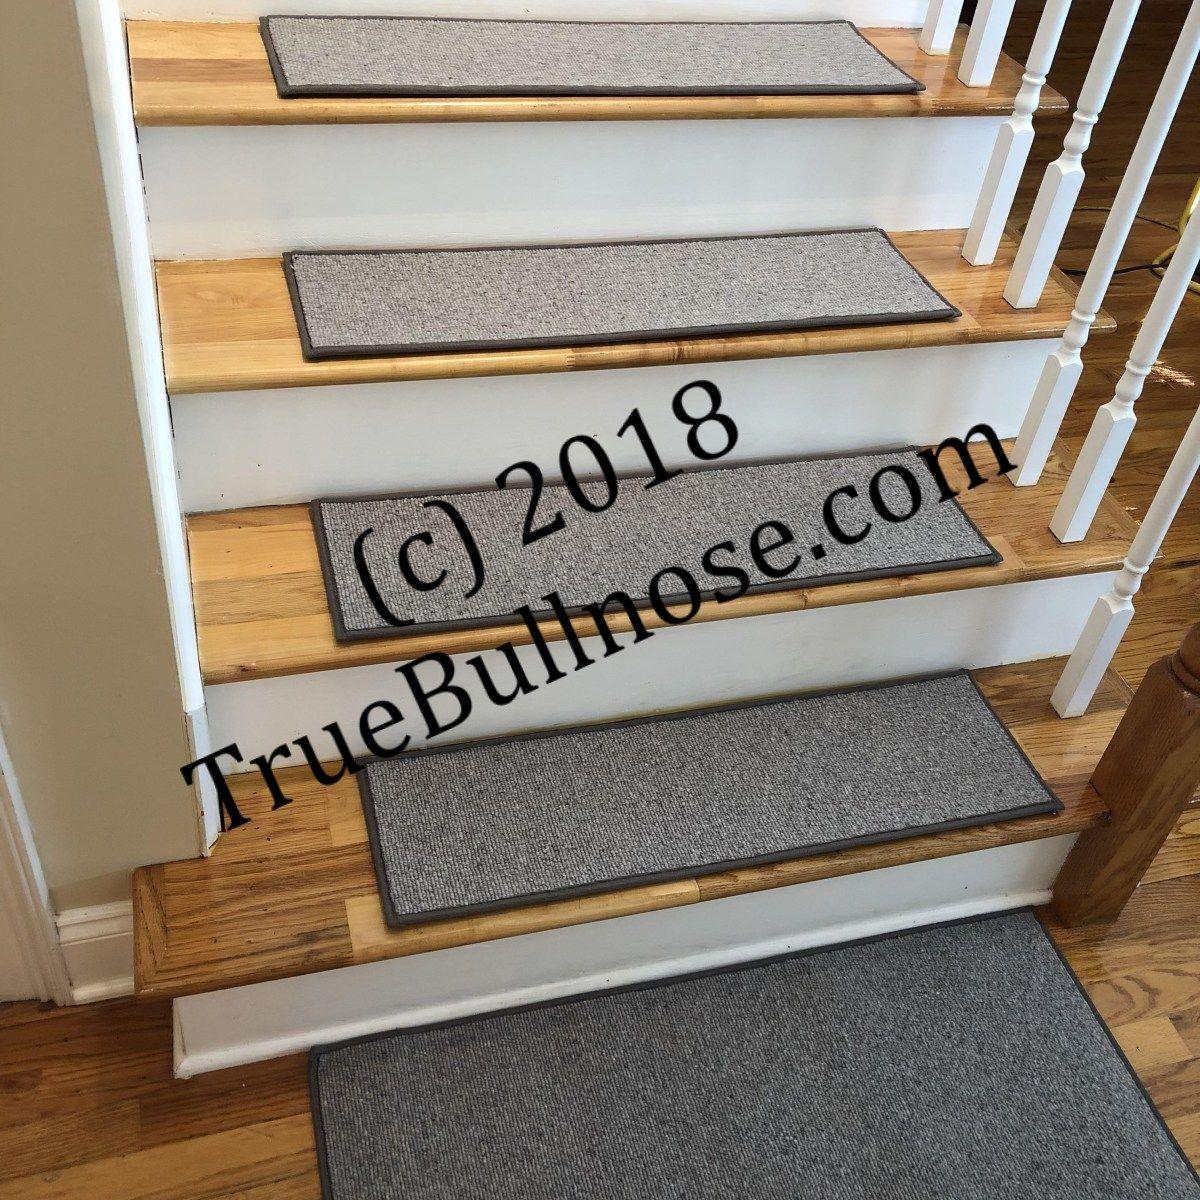 Rectangular Flat Morocco Quarry Grey 100 Wool Carpet Stair Tread   Cheap Carpet Stair Treads   Carpet Runners   Wall Carpet   Wool Carpet   Rugs   Stair Runner